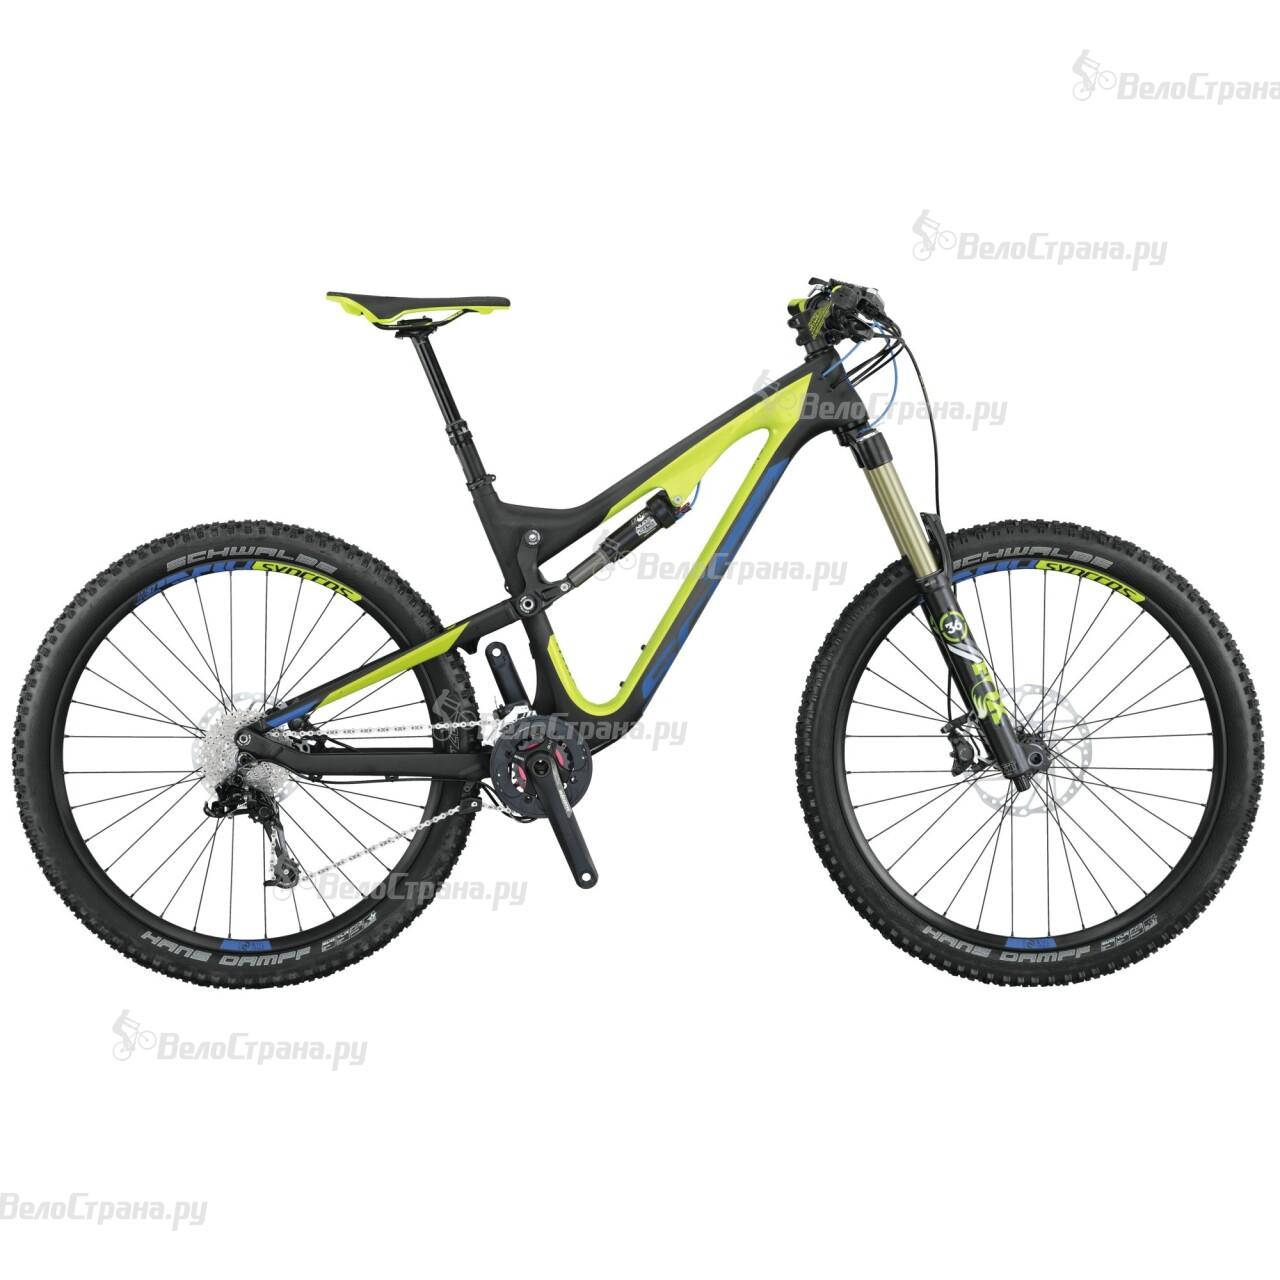 Велосипед Scott Genius LT 710 (2015) genius hs 300a silver